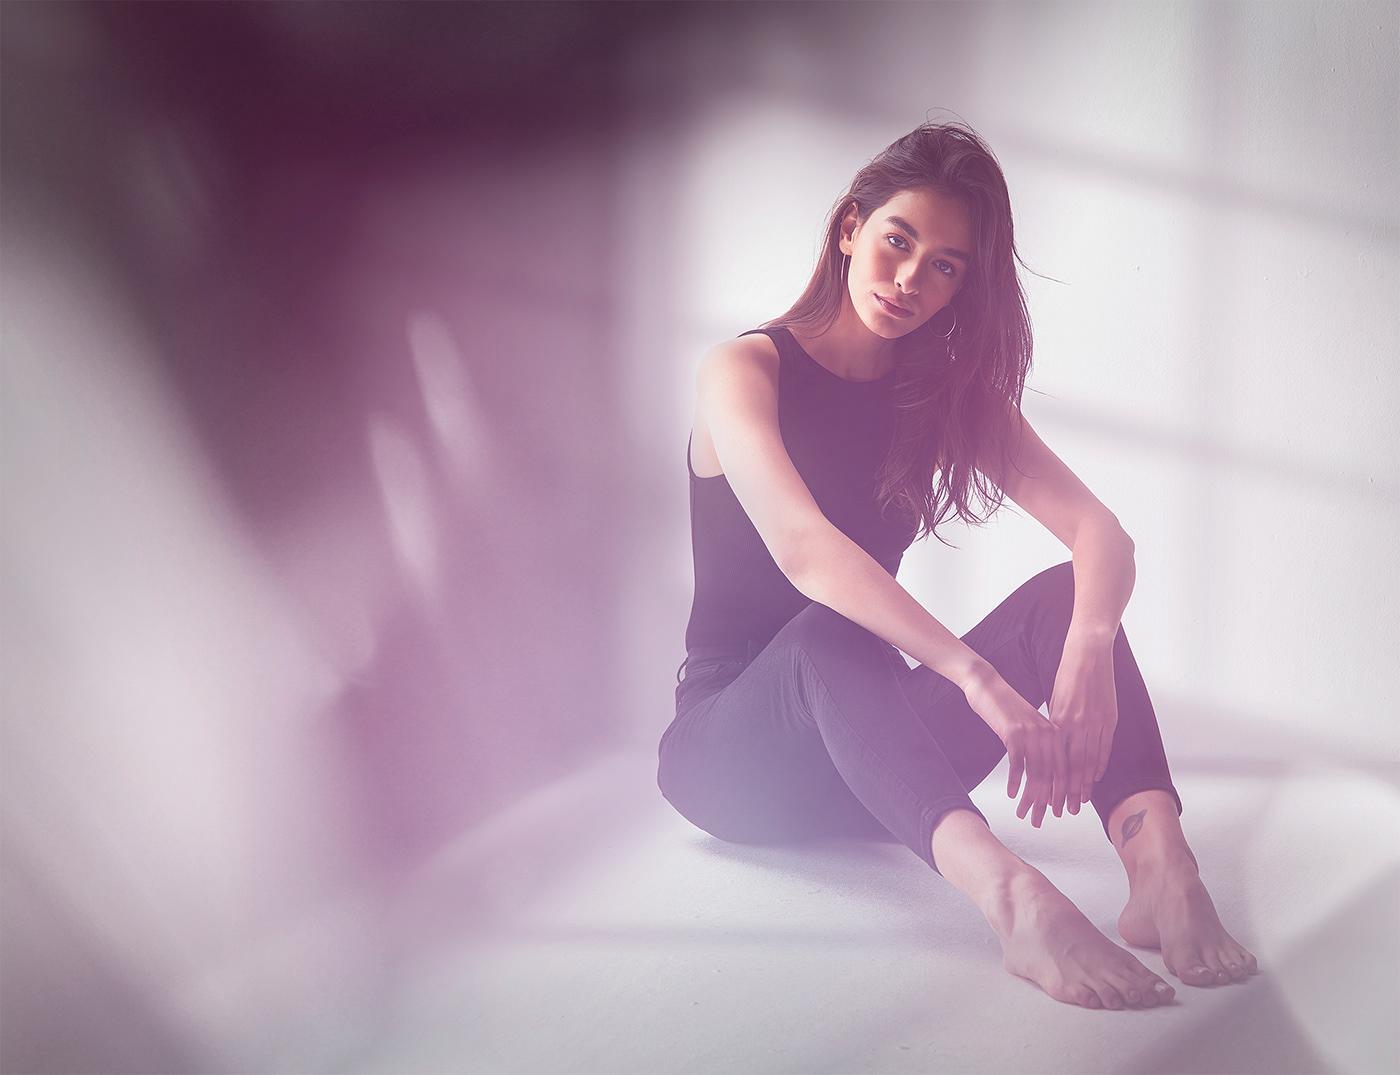 editorial Fashion  lighting model portrait retouching  studio